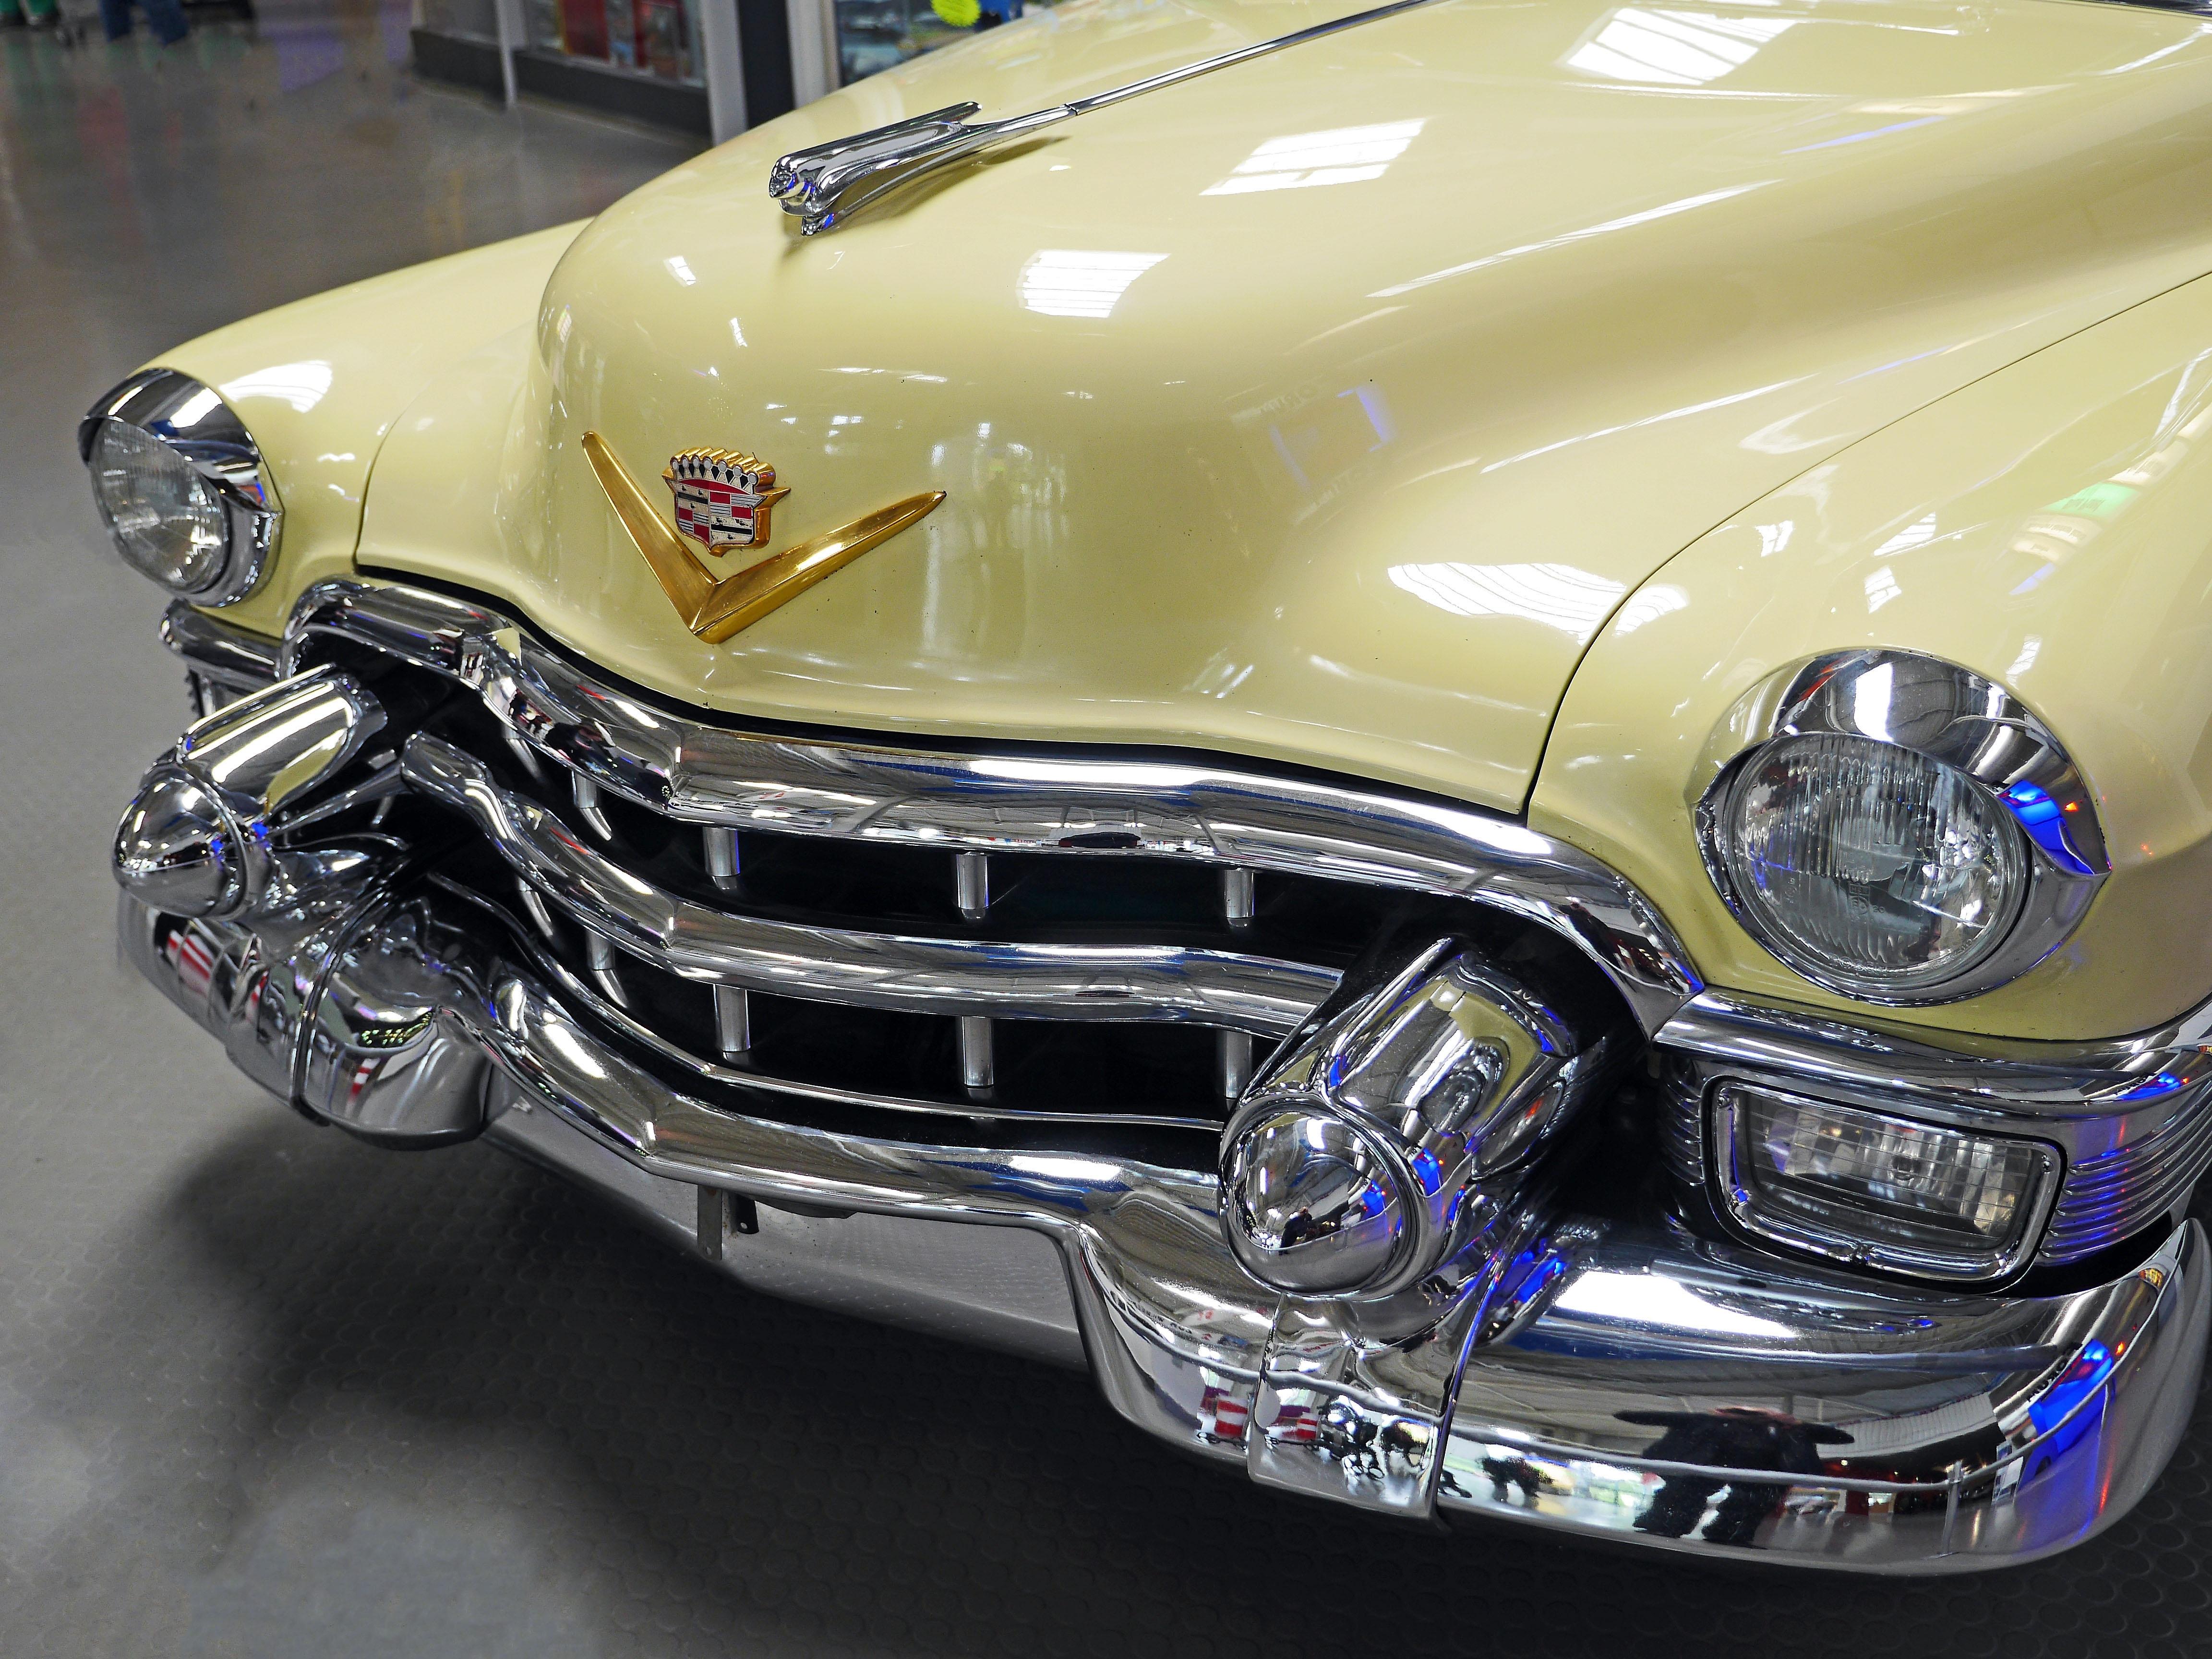 Free Images : old, museum, usa, nostalgia, grille, motor vehicle ...